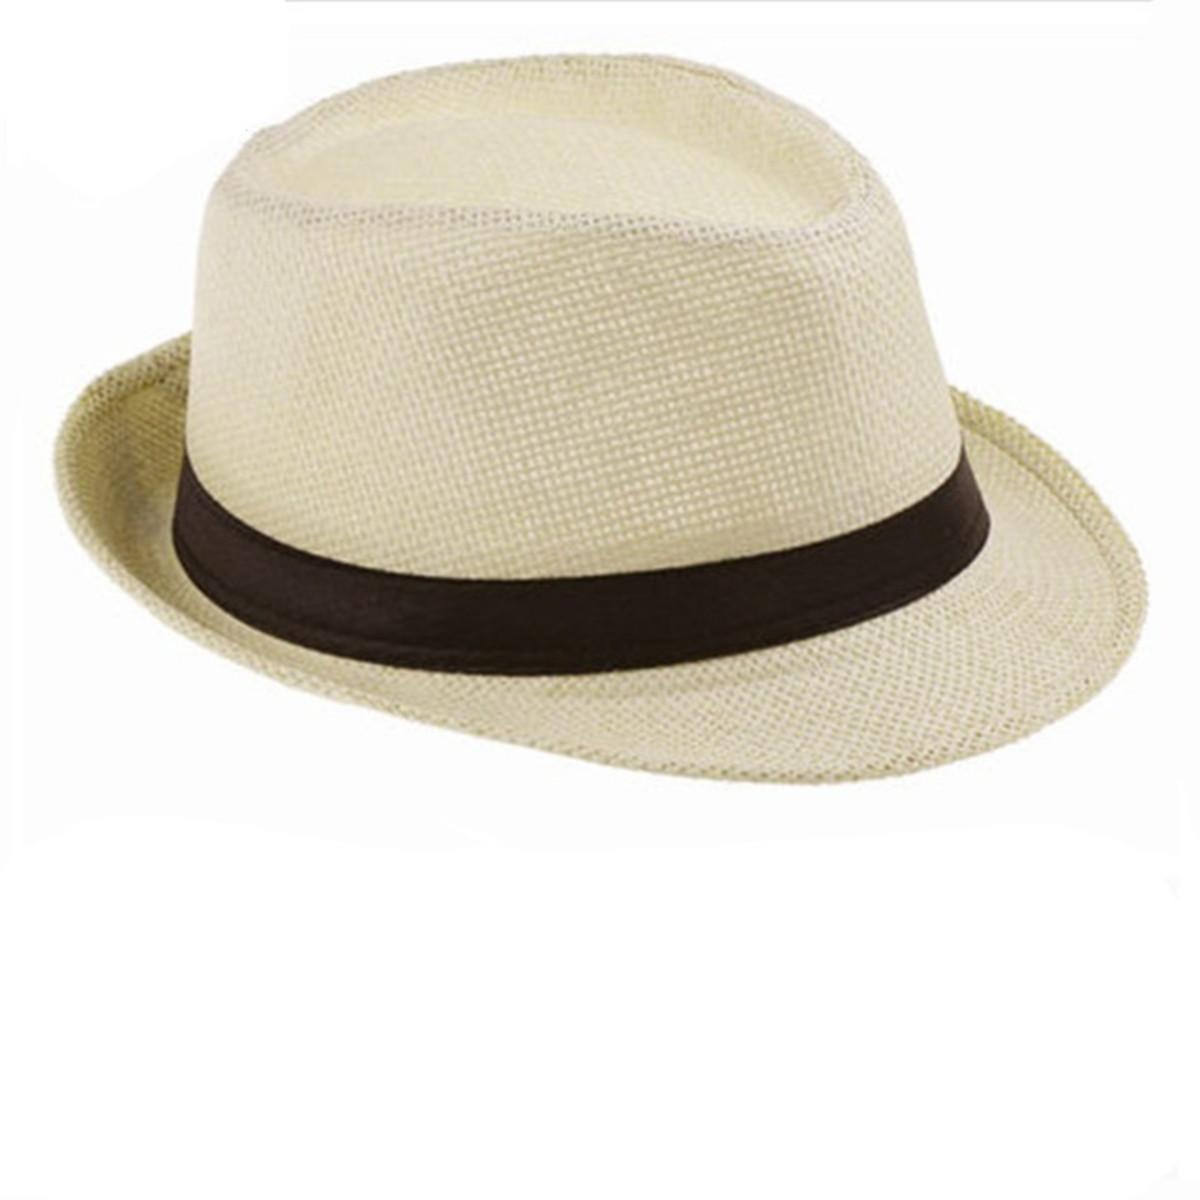 3c9c248ca660c 50 Chapéu panamá para casamentos no Elo7